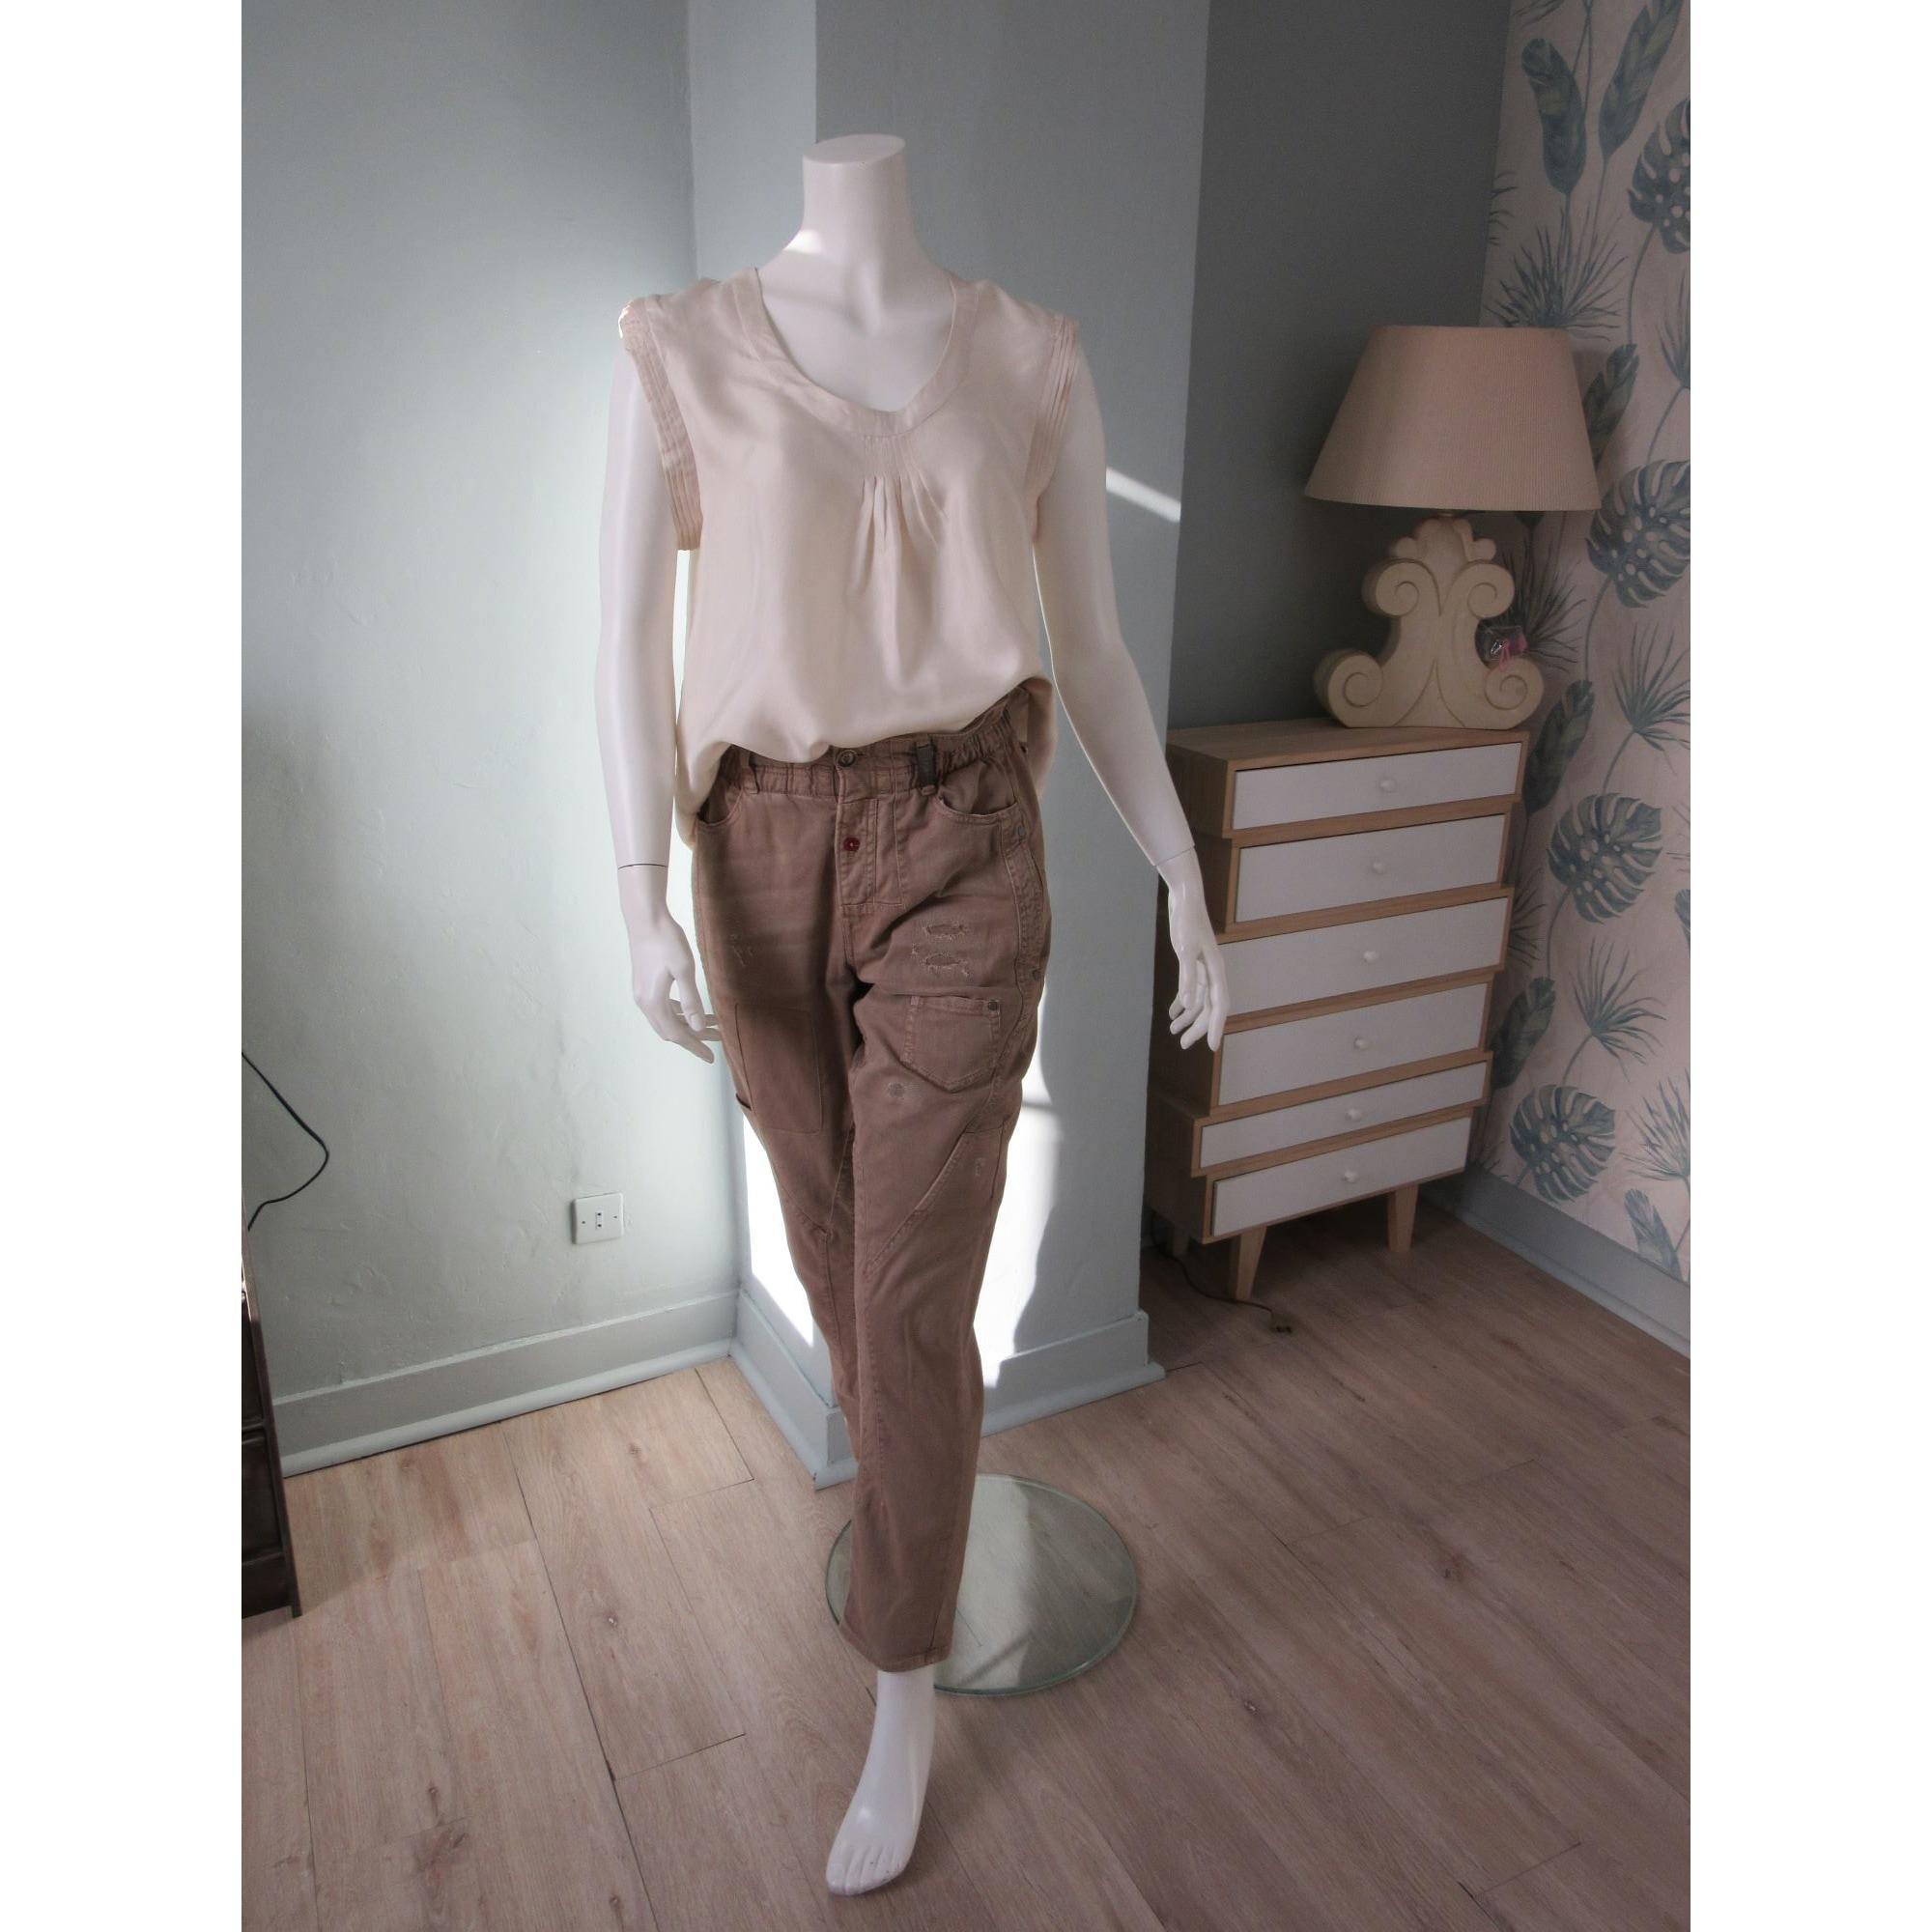 Pantalon large 2 HIGH Beige, camel